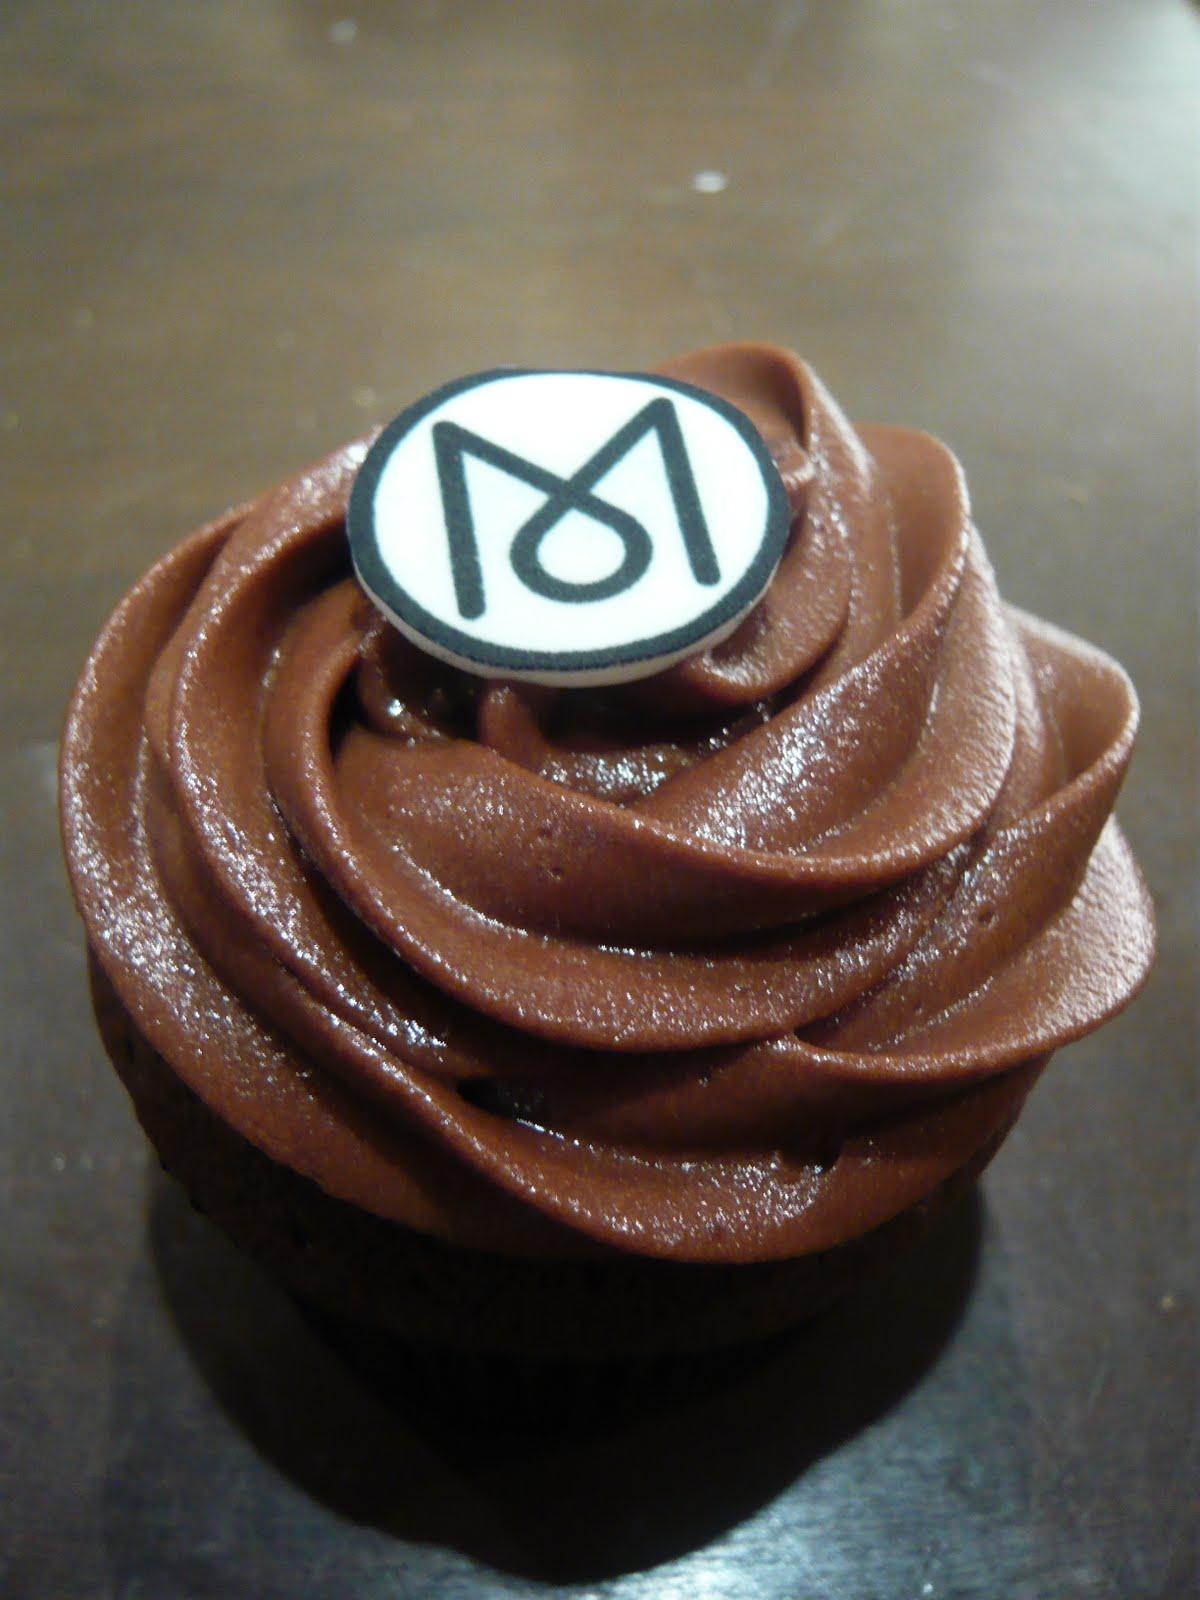 http://1.bp.blogspot.com/_Zta7Ok6hyX8/TJW_tgqHWPI/AAAAAAAABH0/28NbzMK5Kp8/s1600/Monocle+cupcakes.JPG